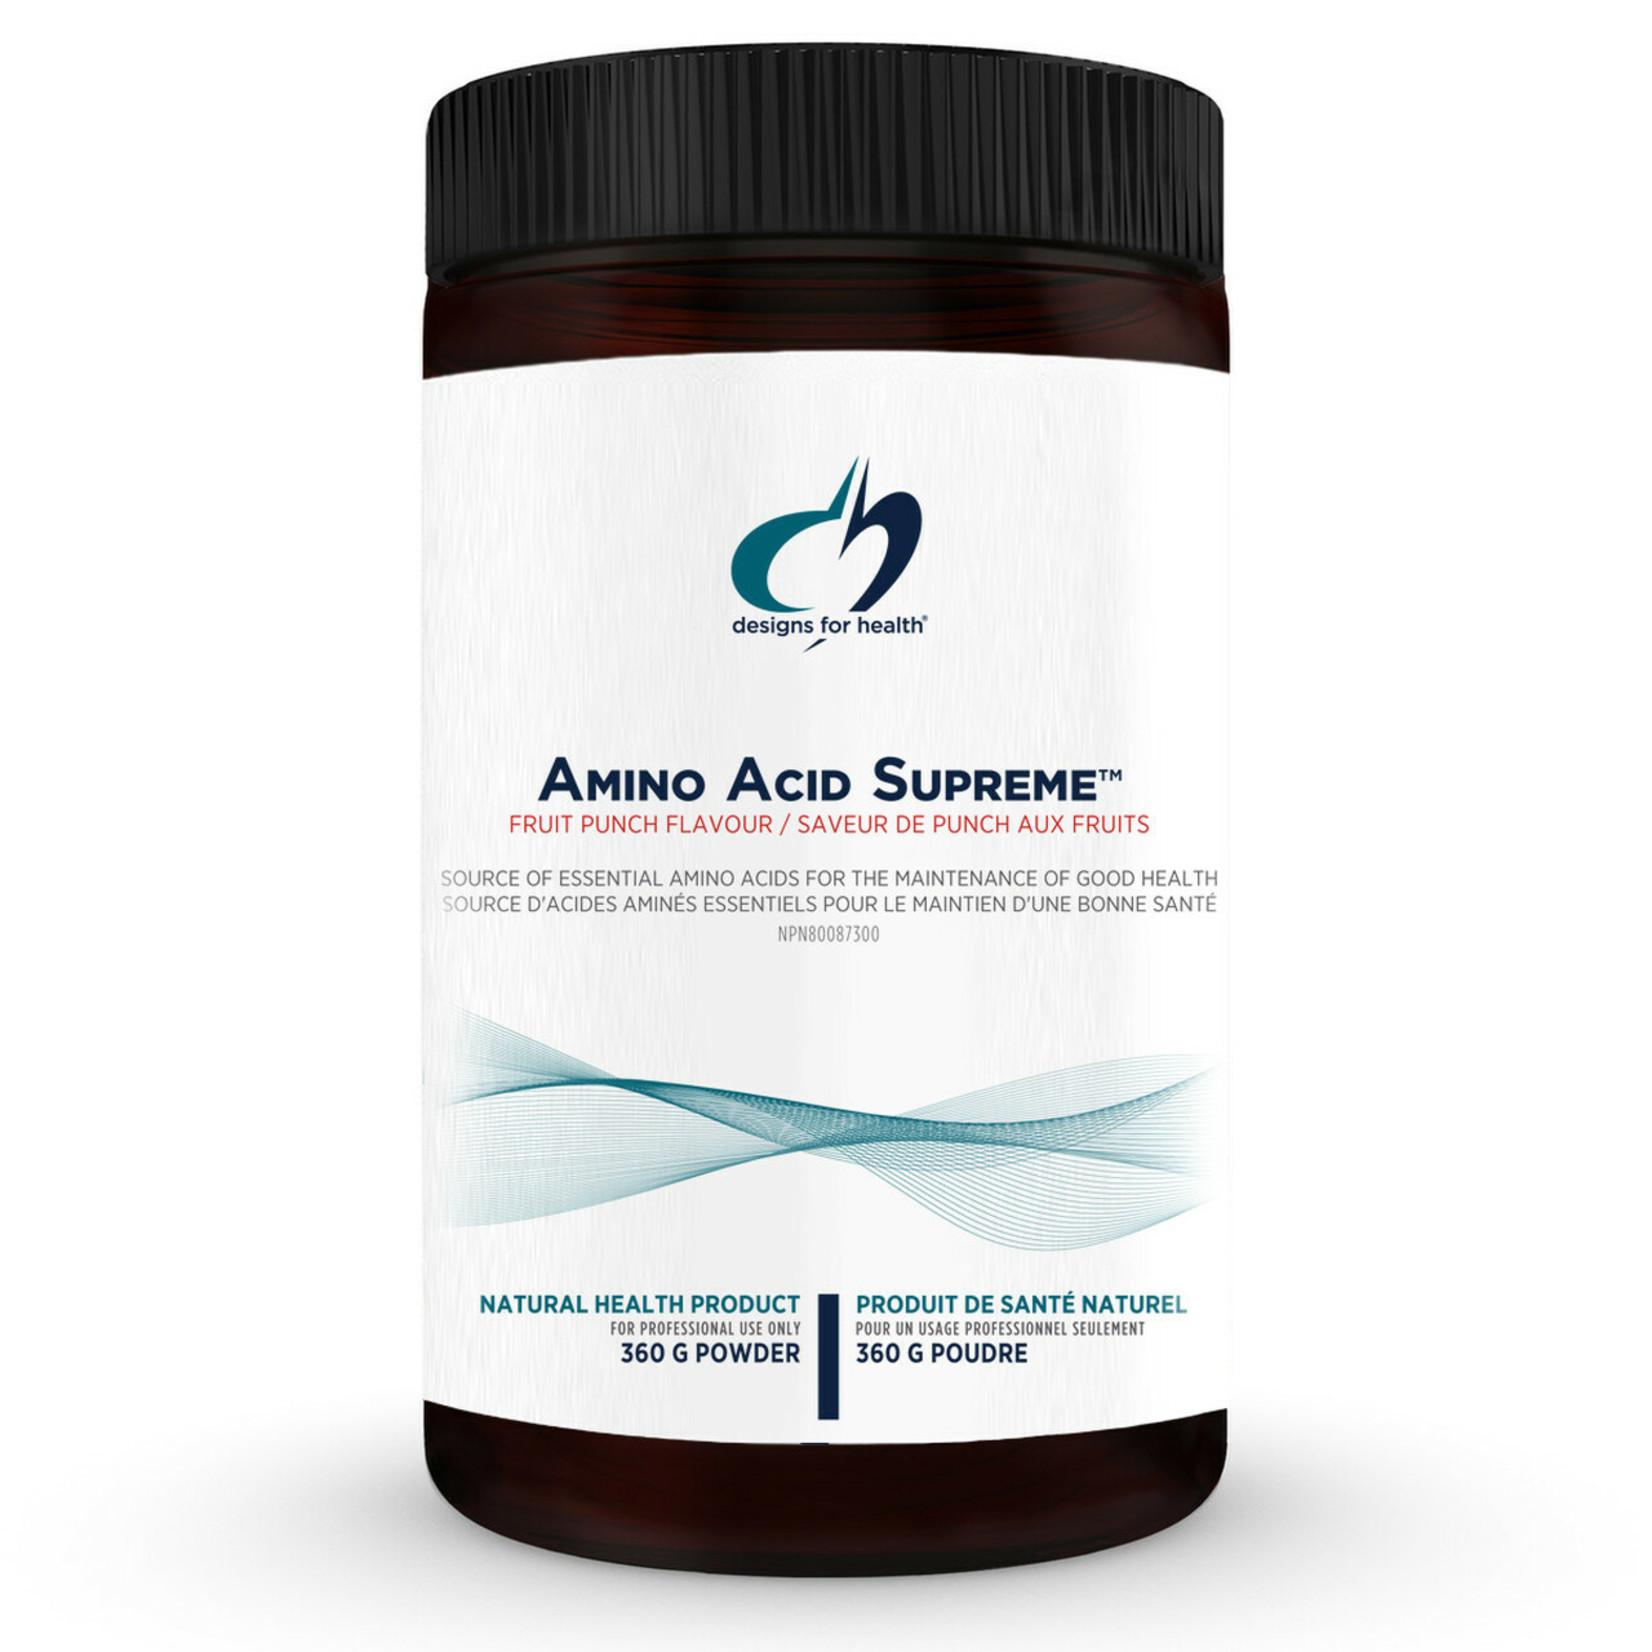 Designs for Health Amino Acid Supreme - Fruit Punch 360g Powder